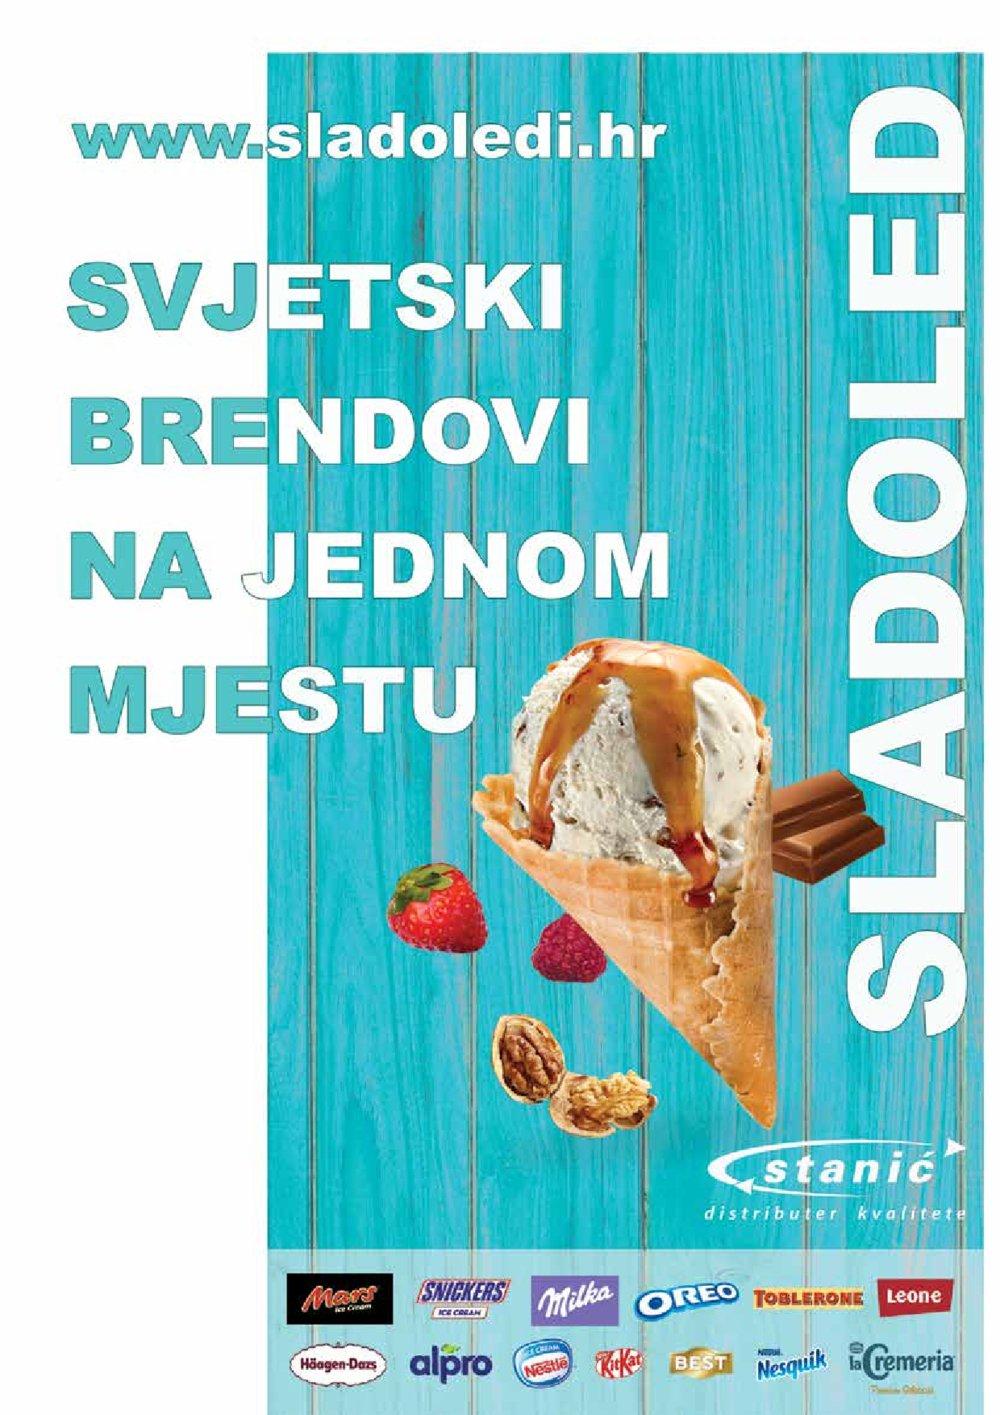 Diskont Stanić katalog Sladoleda 26.03.-15.09.2021.